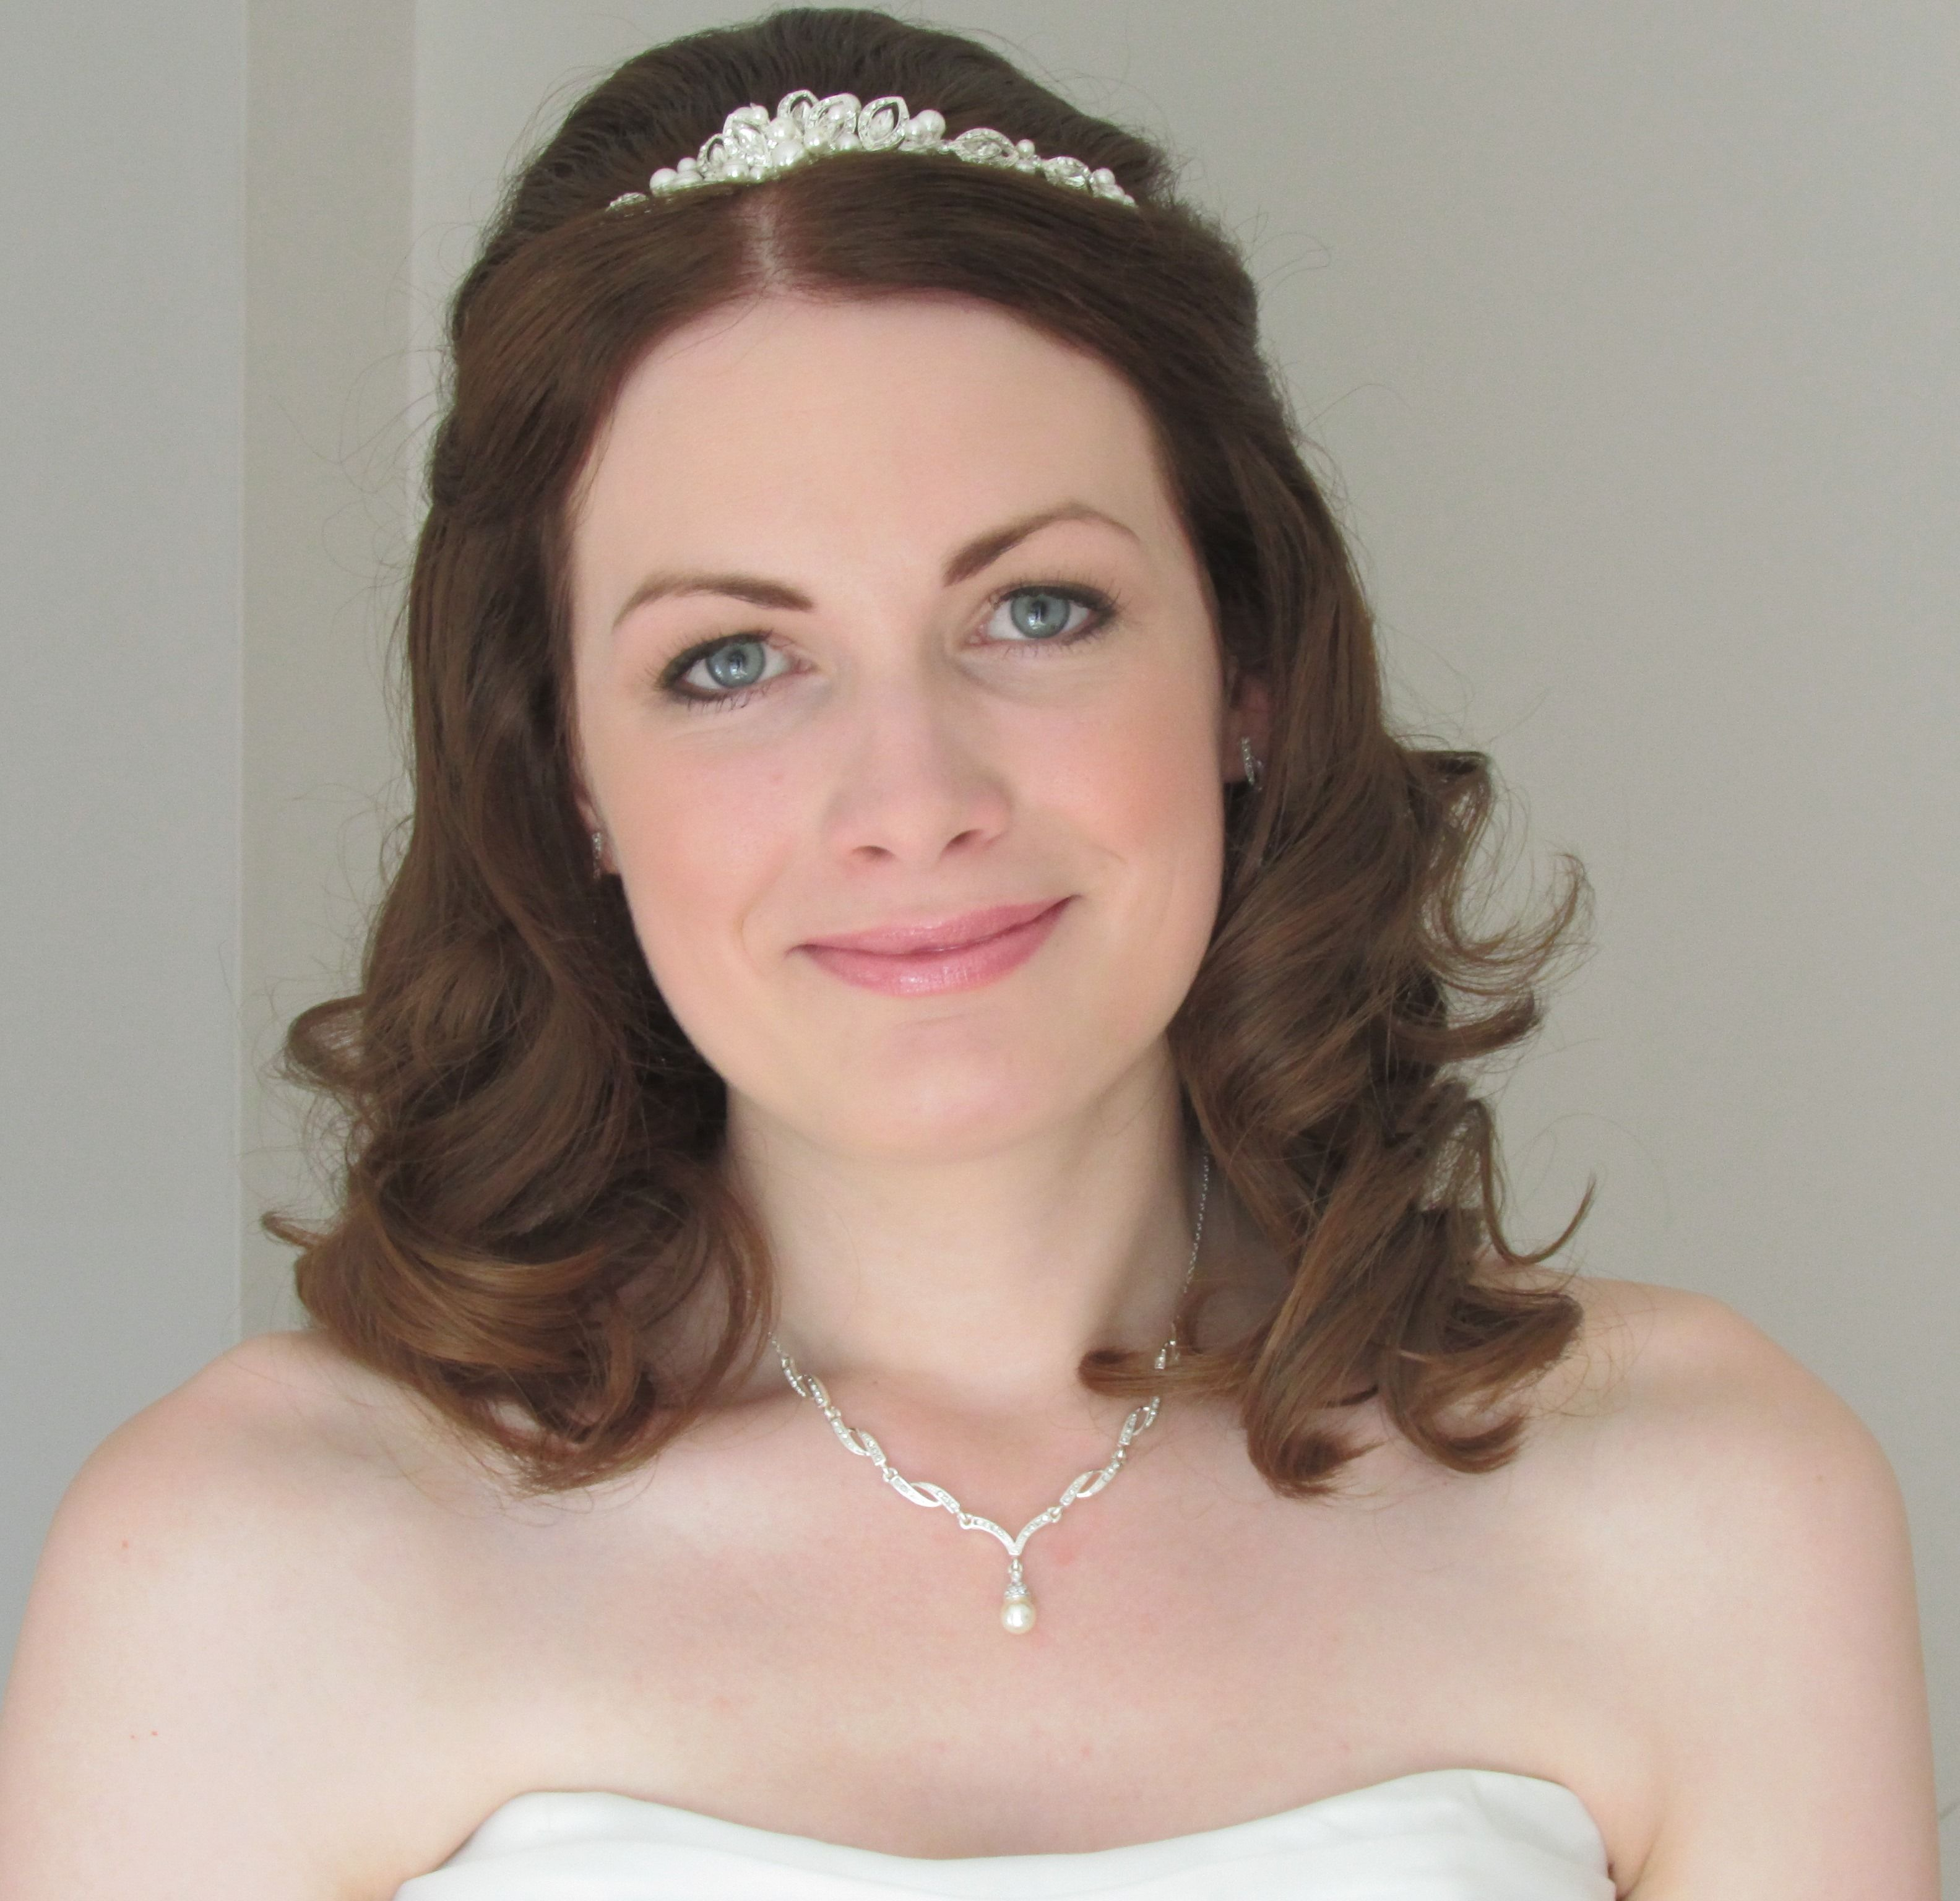 Elegant Wedding Hair And Makeup : Bridal makeup and elegant waves Bridal Hair and Makeup ...